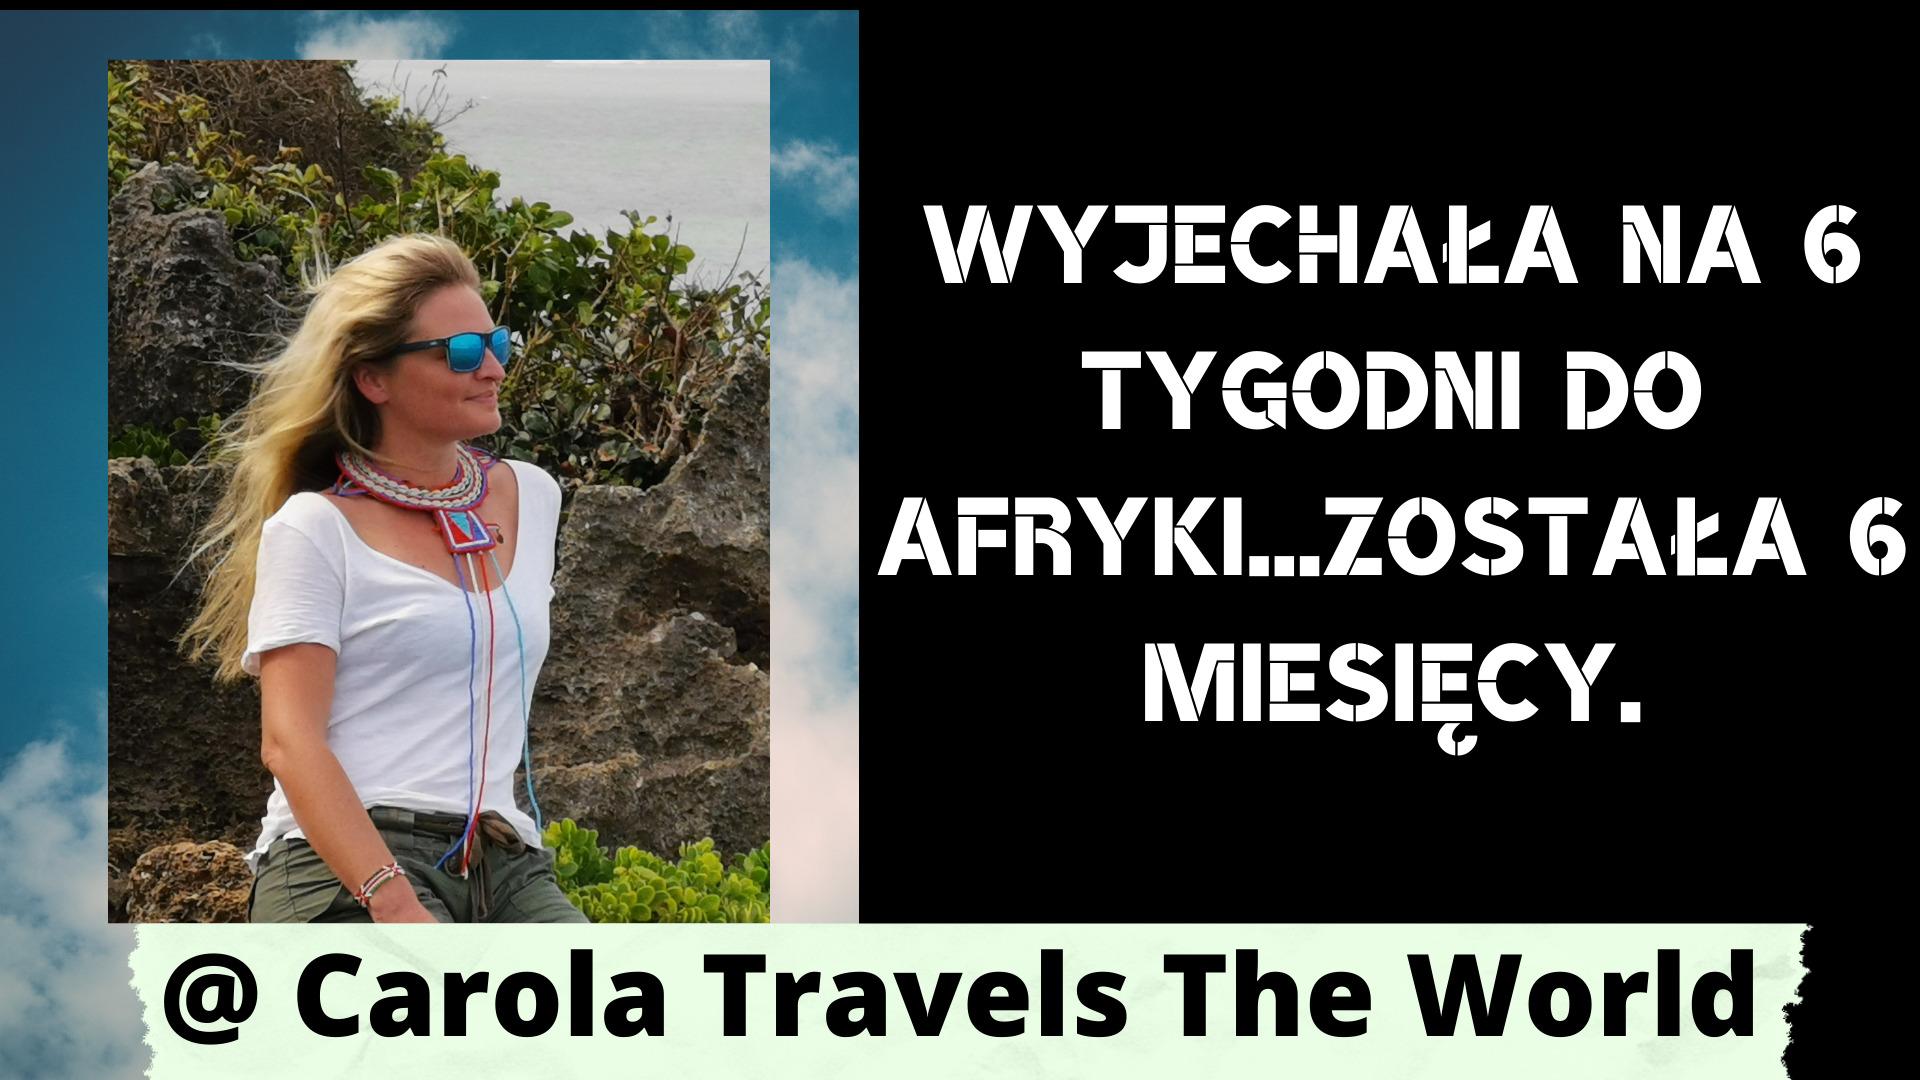 Carola Travels The World